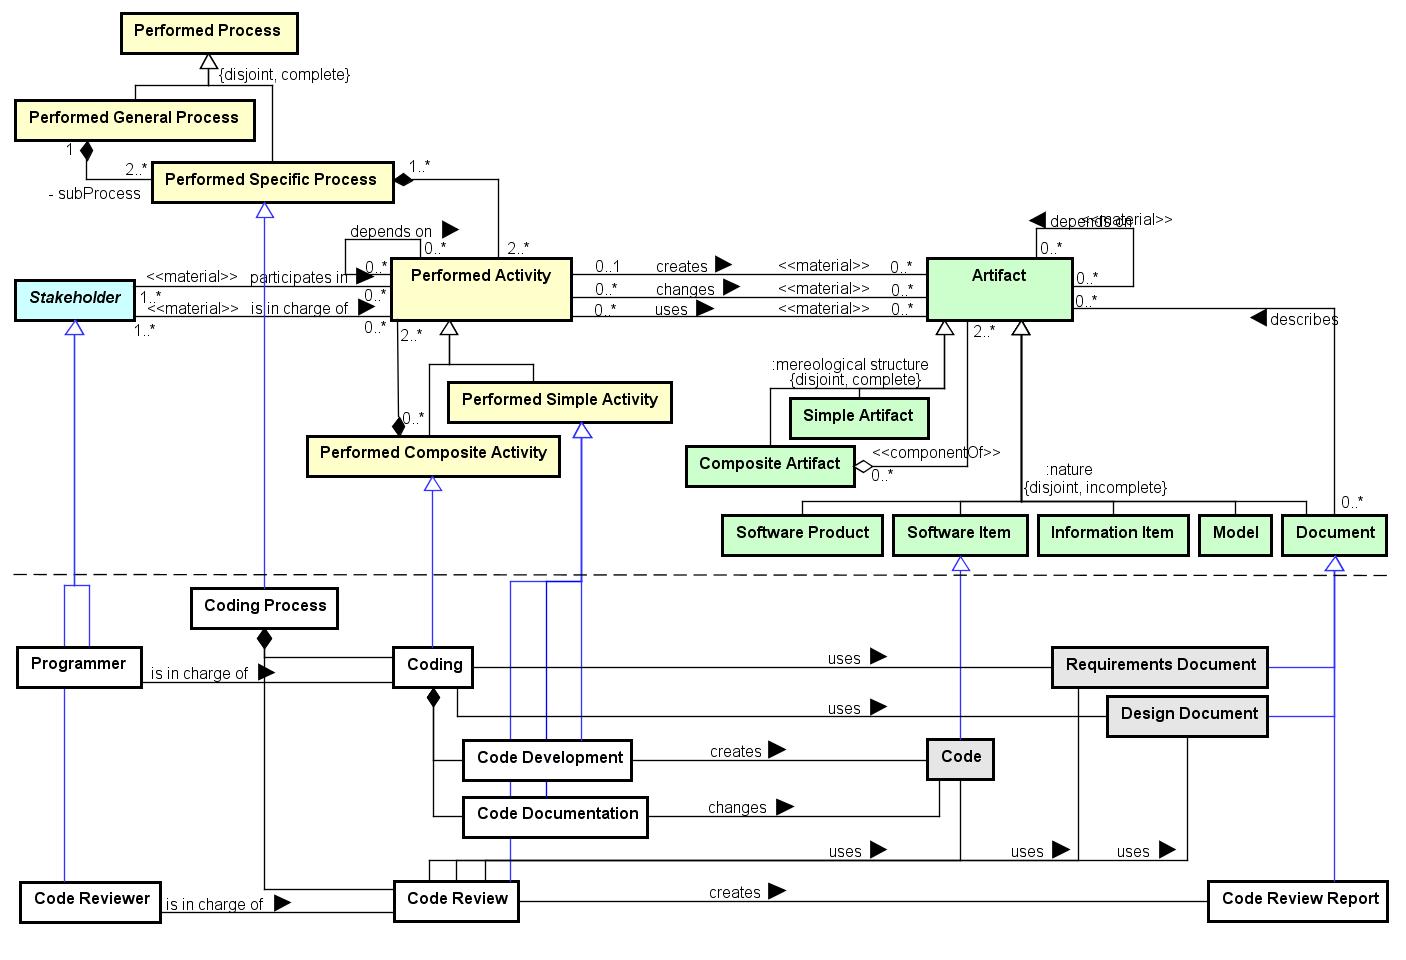 3 ontology models - Documentation Review Process